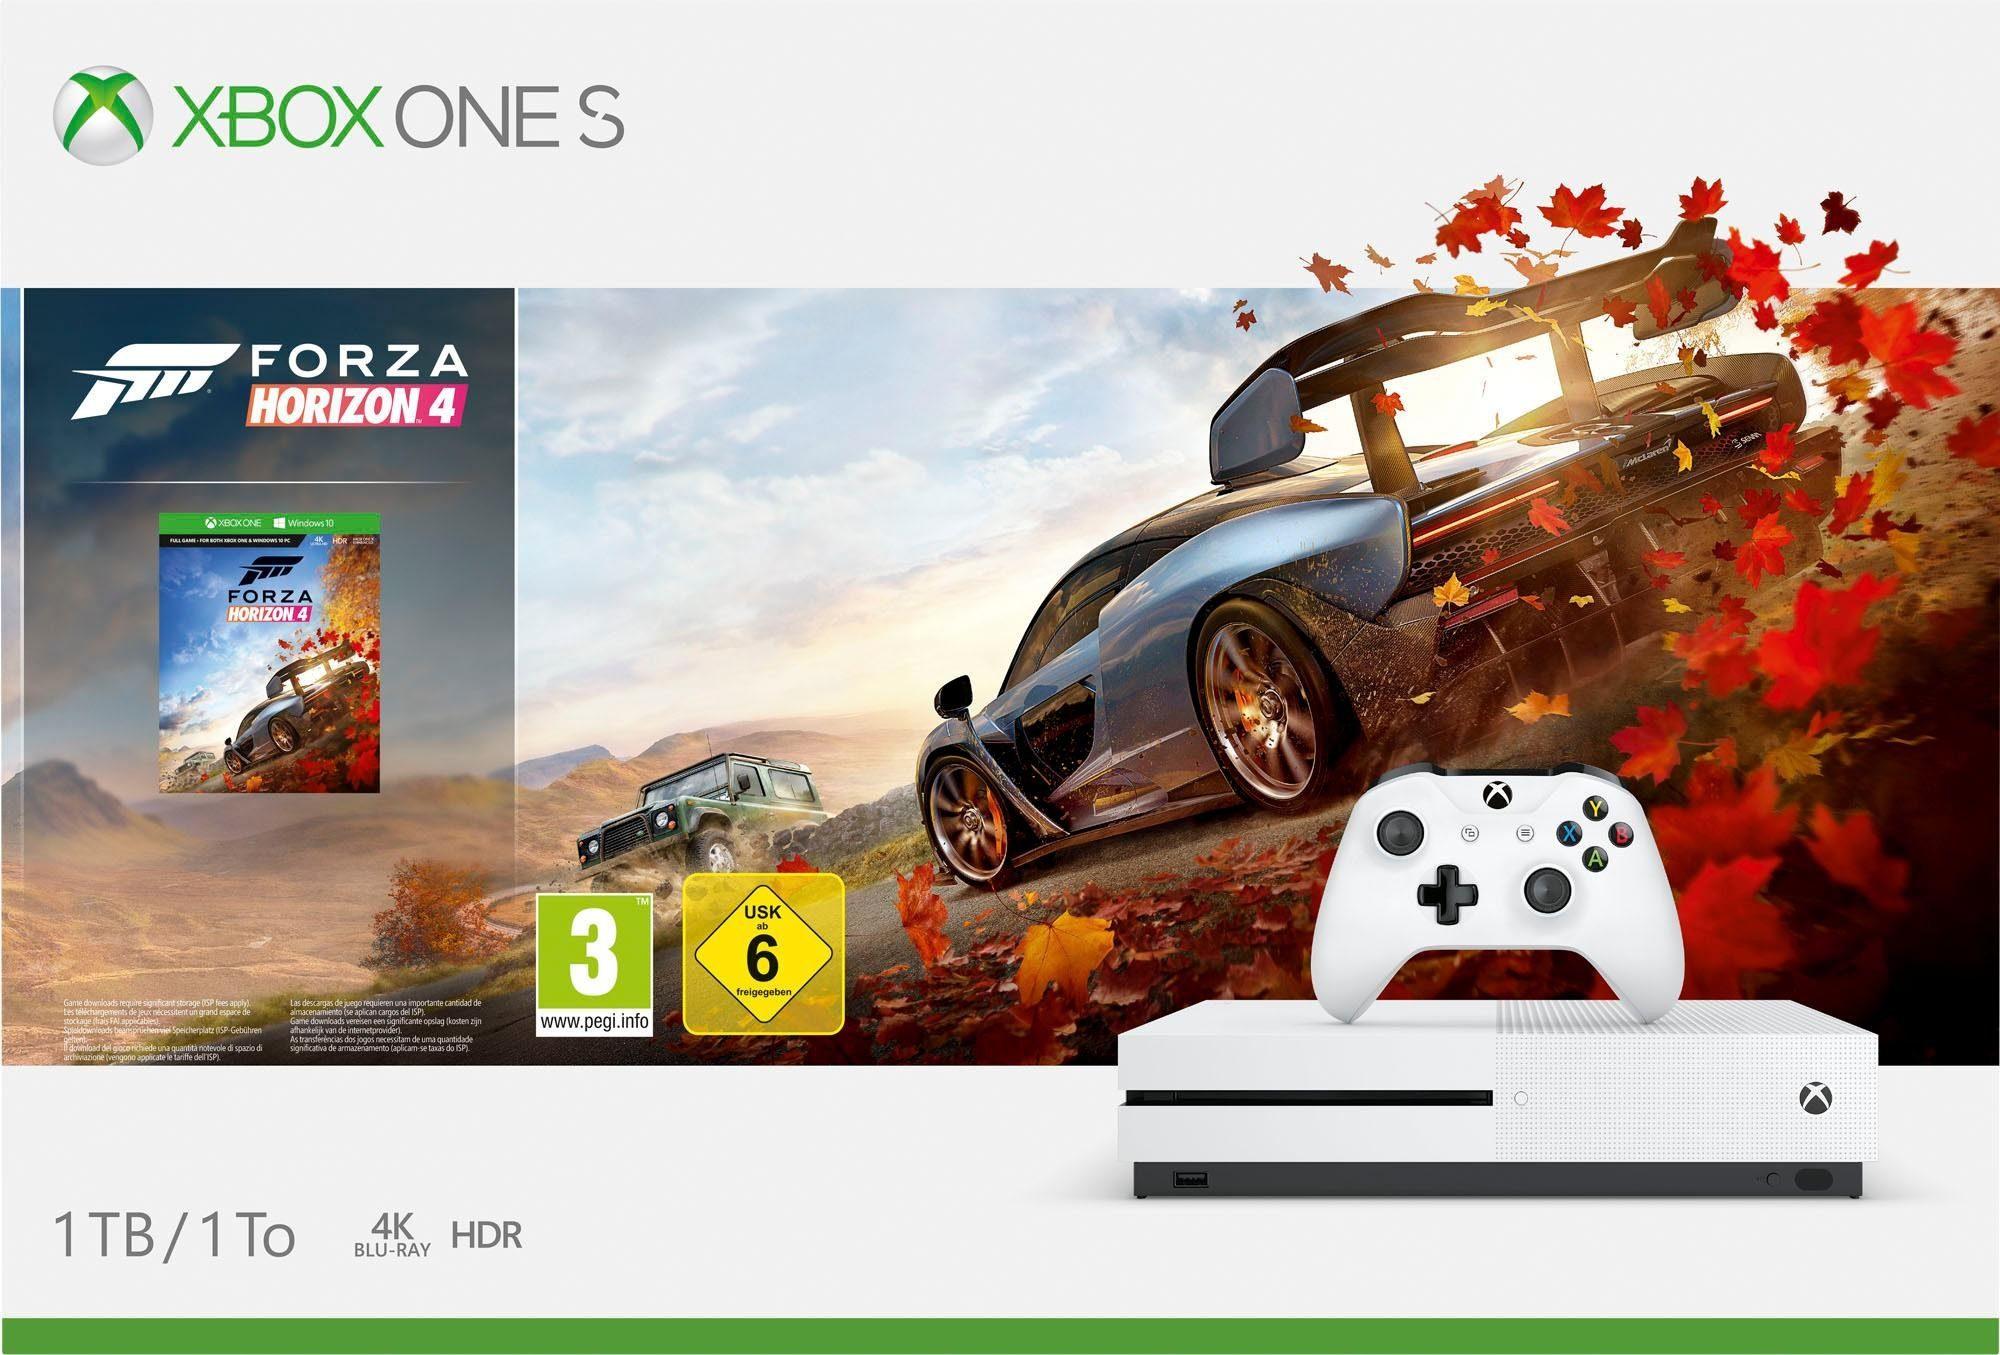 [OTTO] Xbox One S 1TB (Bundle, inkl. Forza Horizon 4) bei Otto, erstmal ohne Neukundengutschein